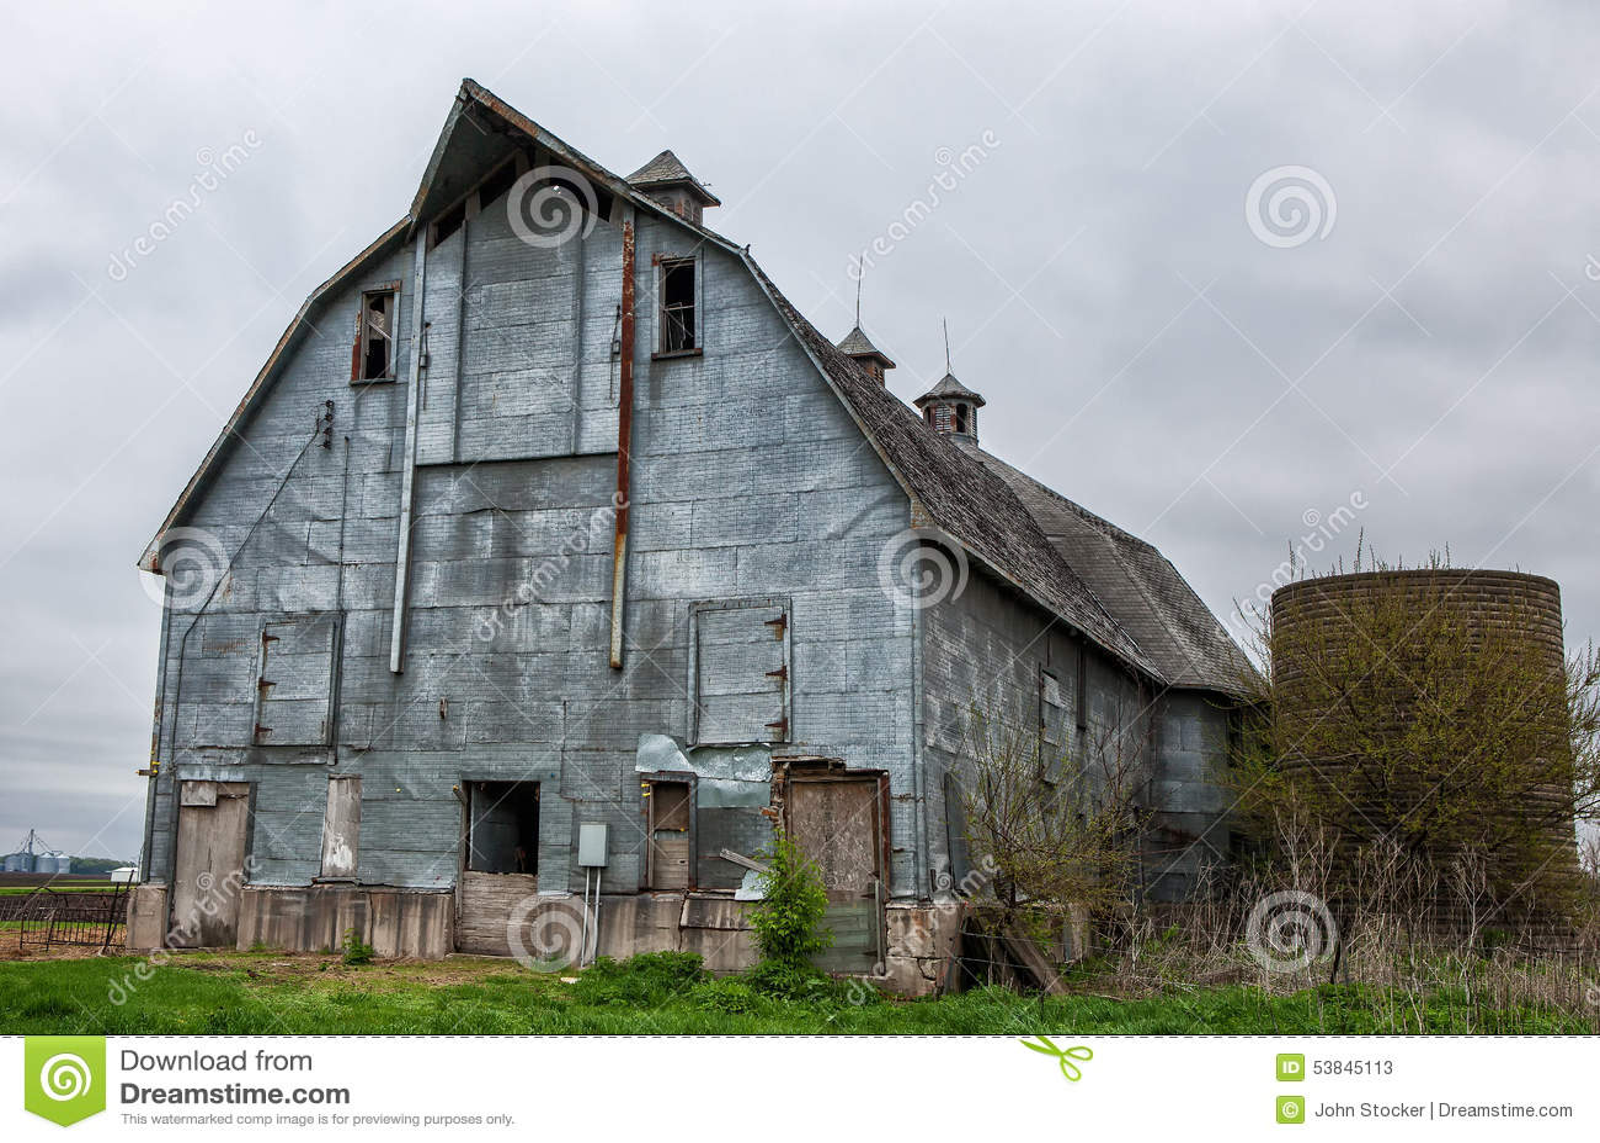 Old Barn 12 Stock Image Image Of Siding Shaped Barn